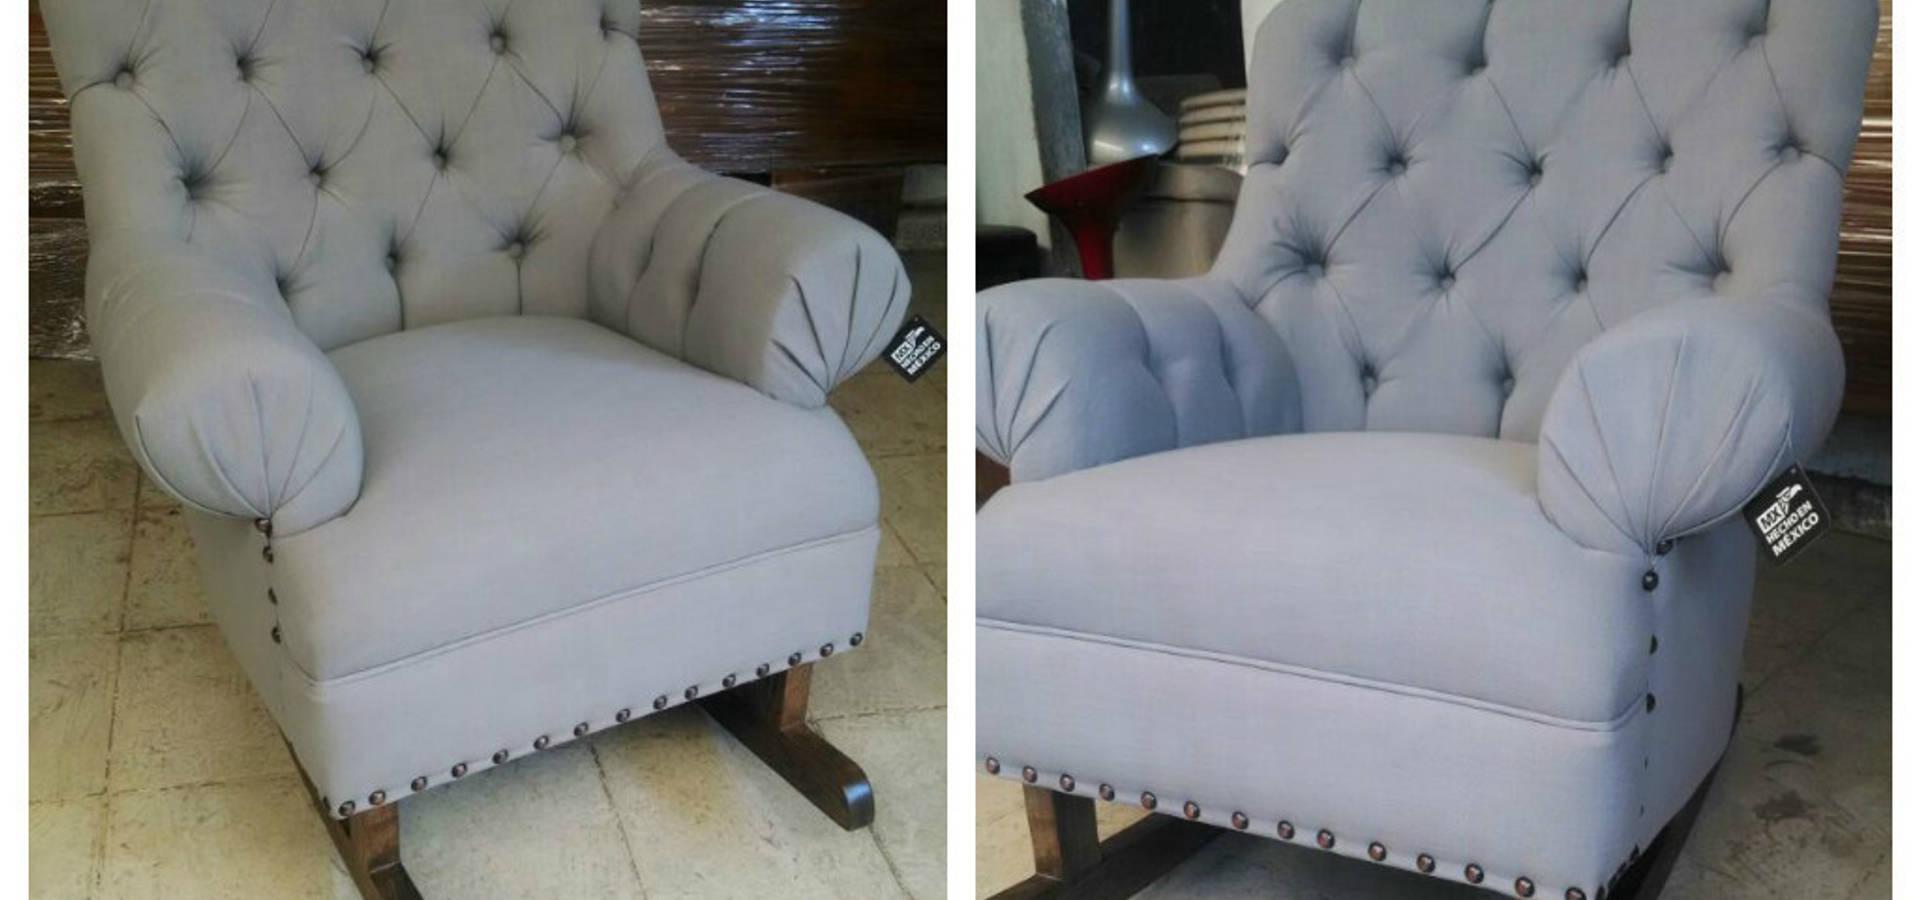 Tendencias de karda muebles homify for Fabrica muebles modernos